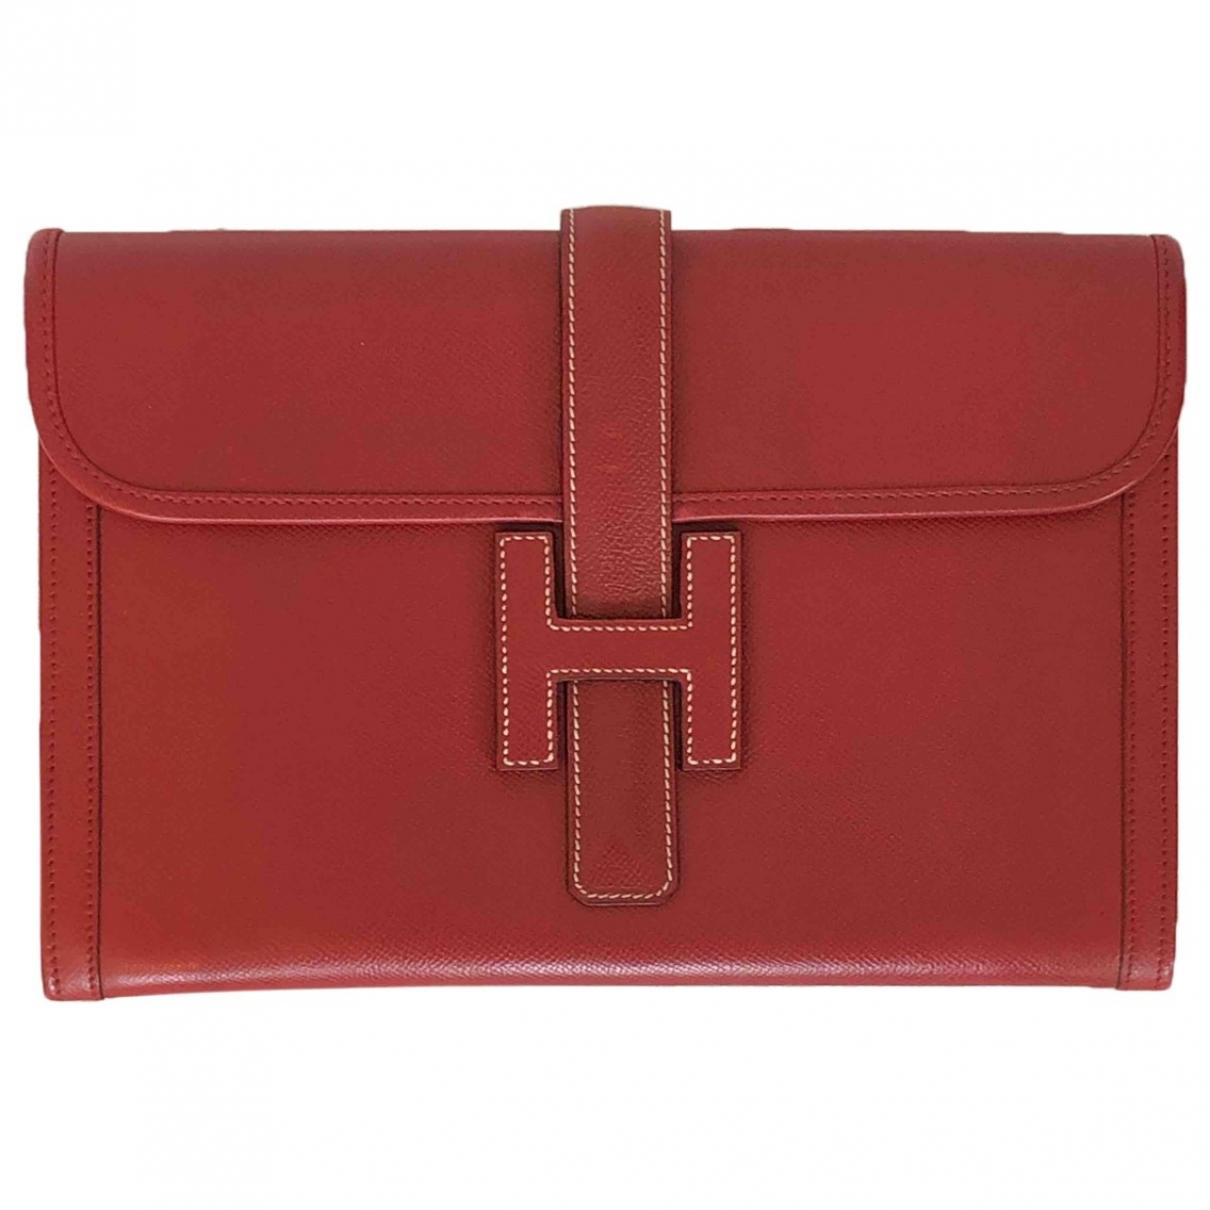 Hermès Jige Red Leather Clutch bag for Women \N